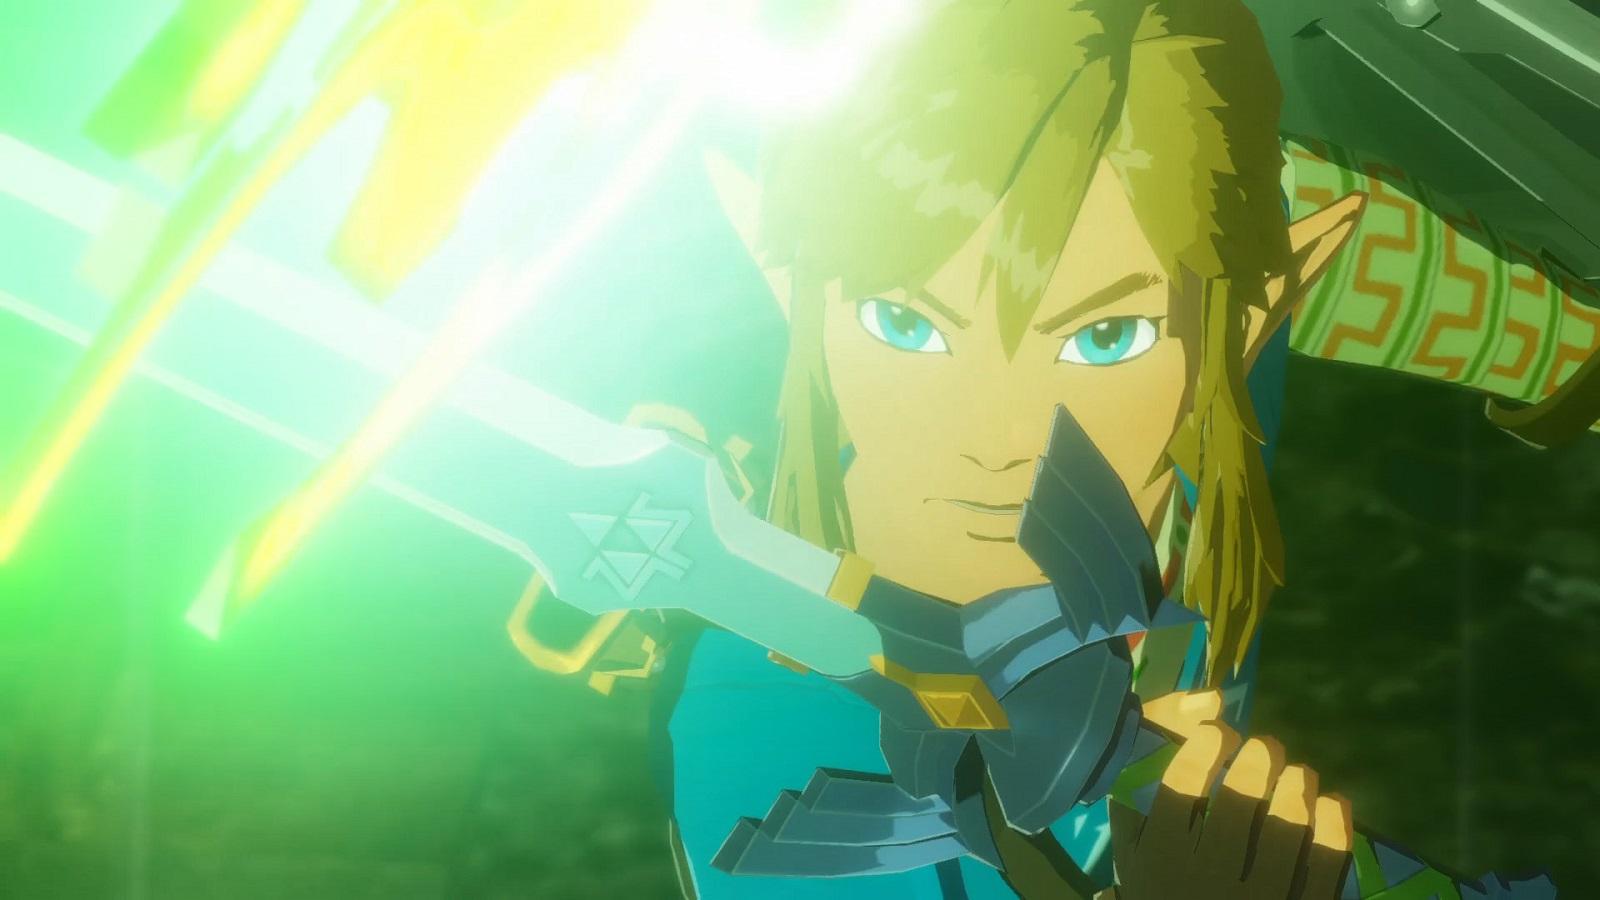 Koei Tecmo похвасталась объёмом отгрузок Hyrule Warriors: Age of Calamity и Nioh 2